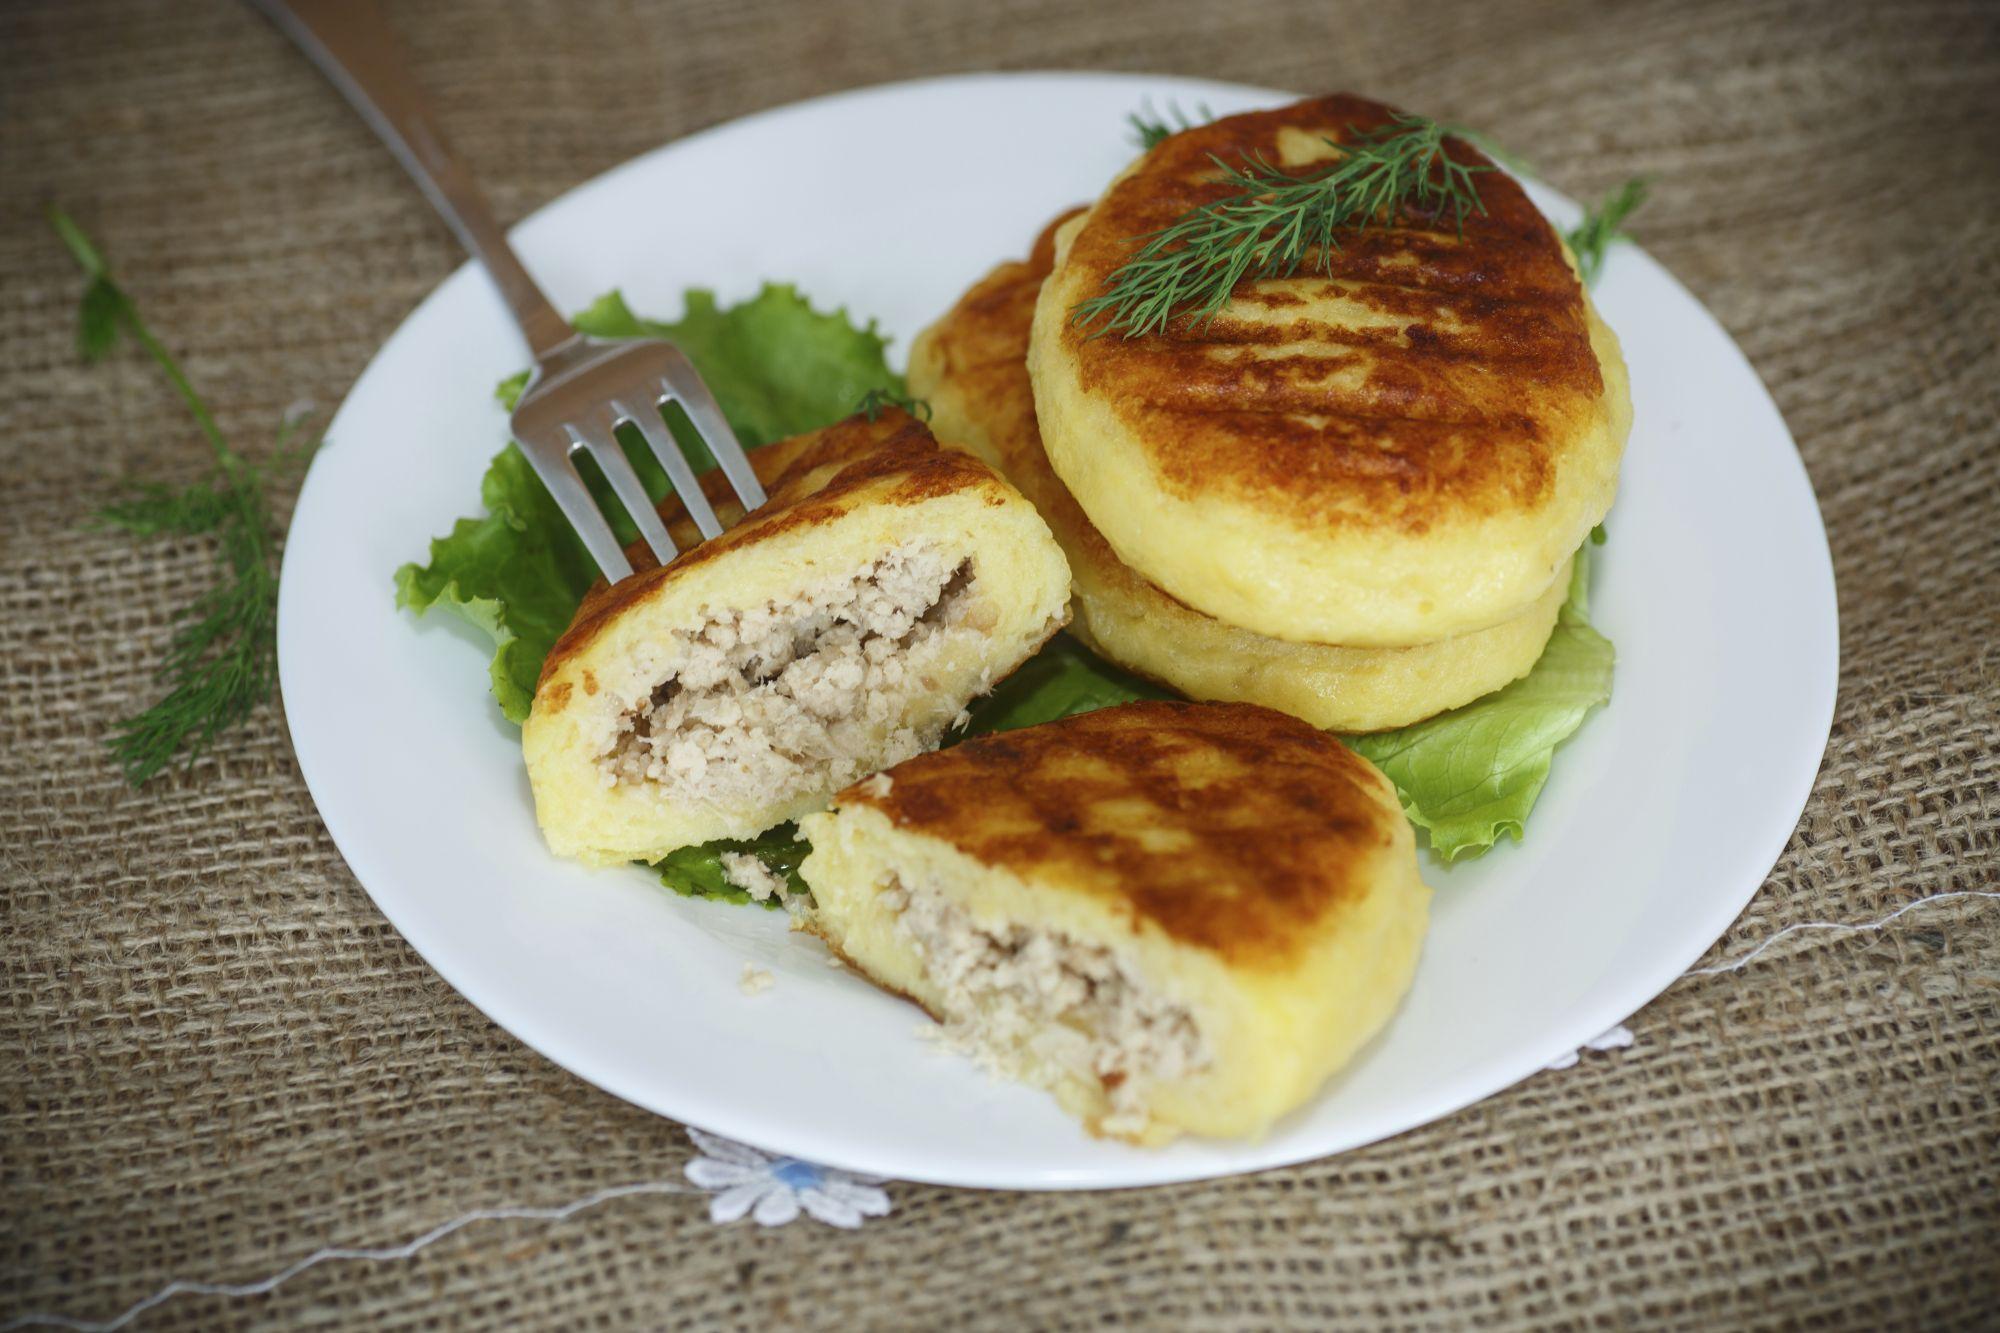 croquetas de patata rellenas de pollo